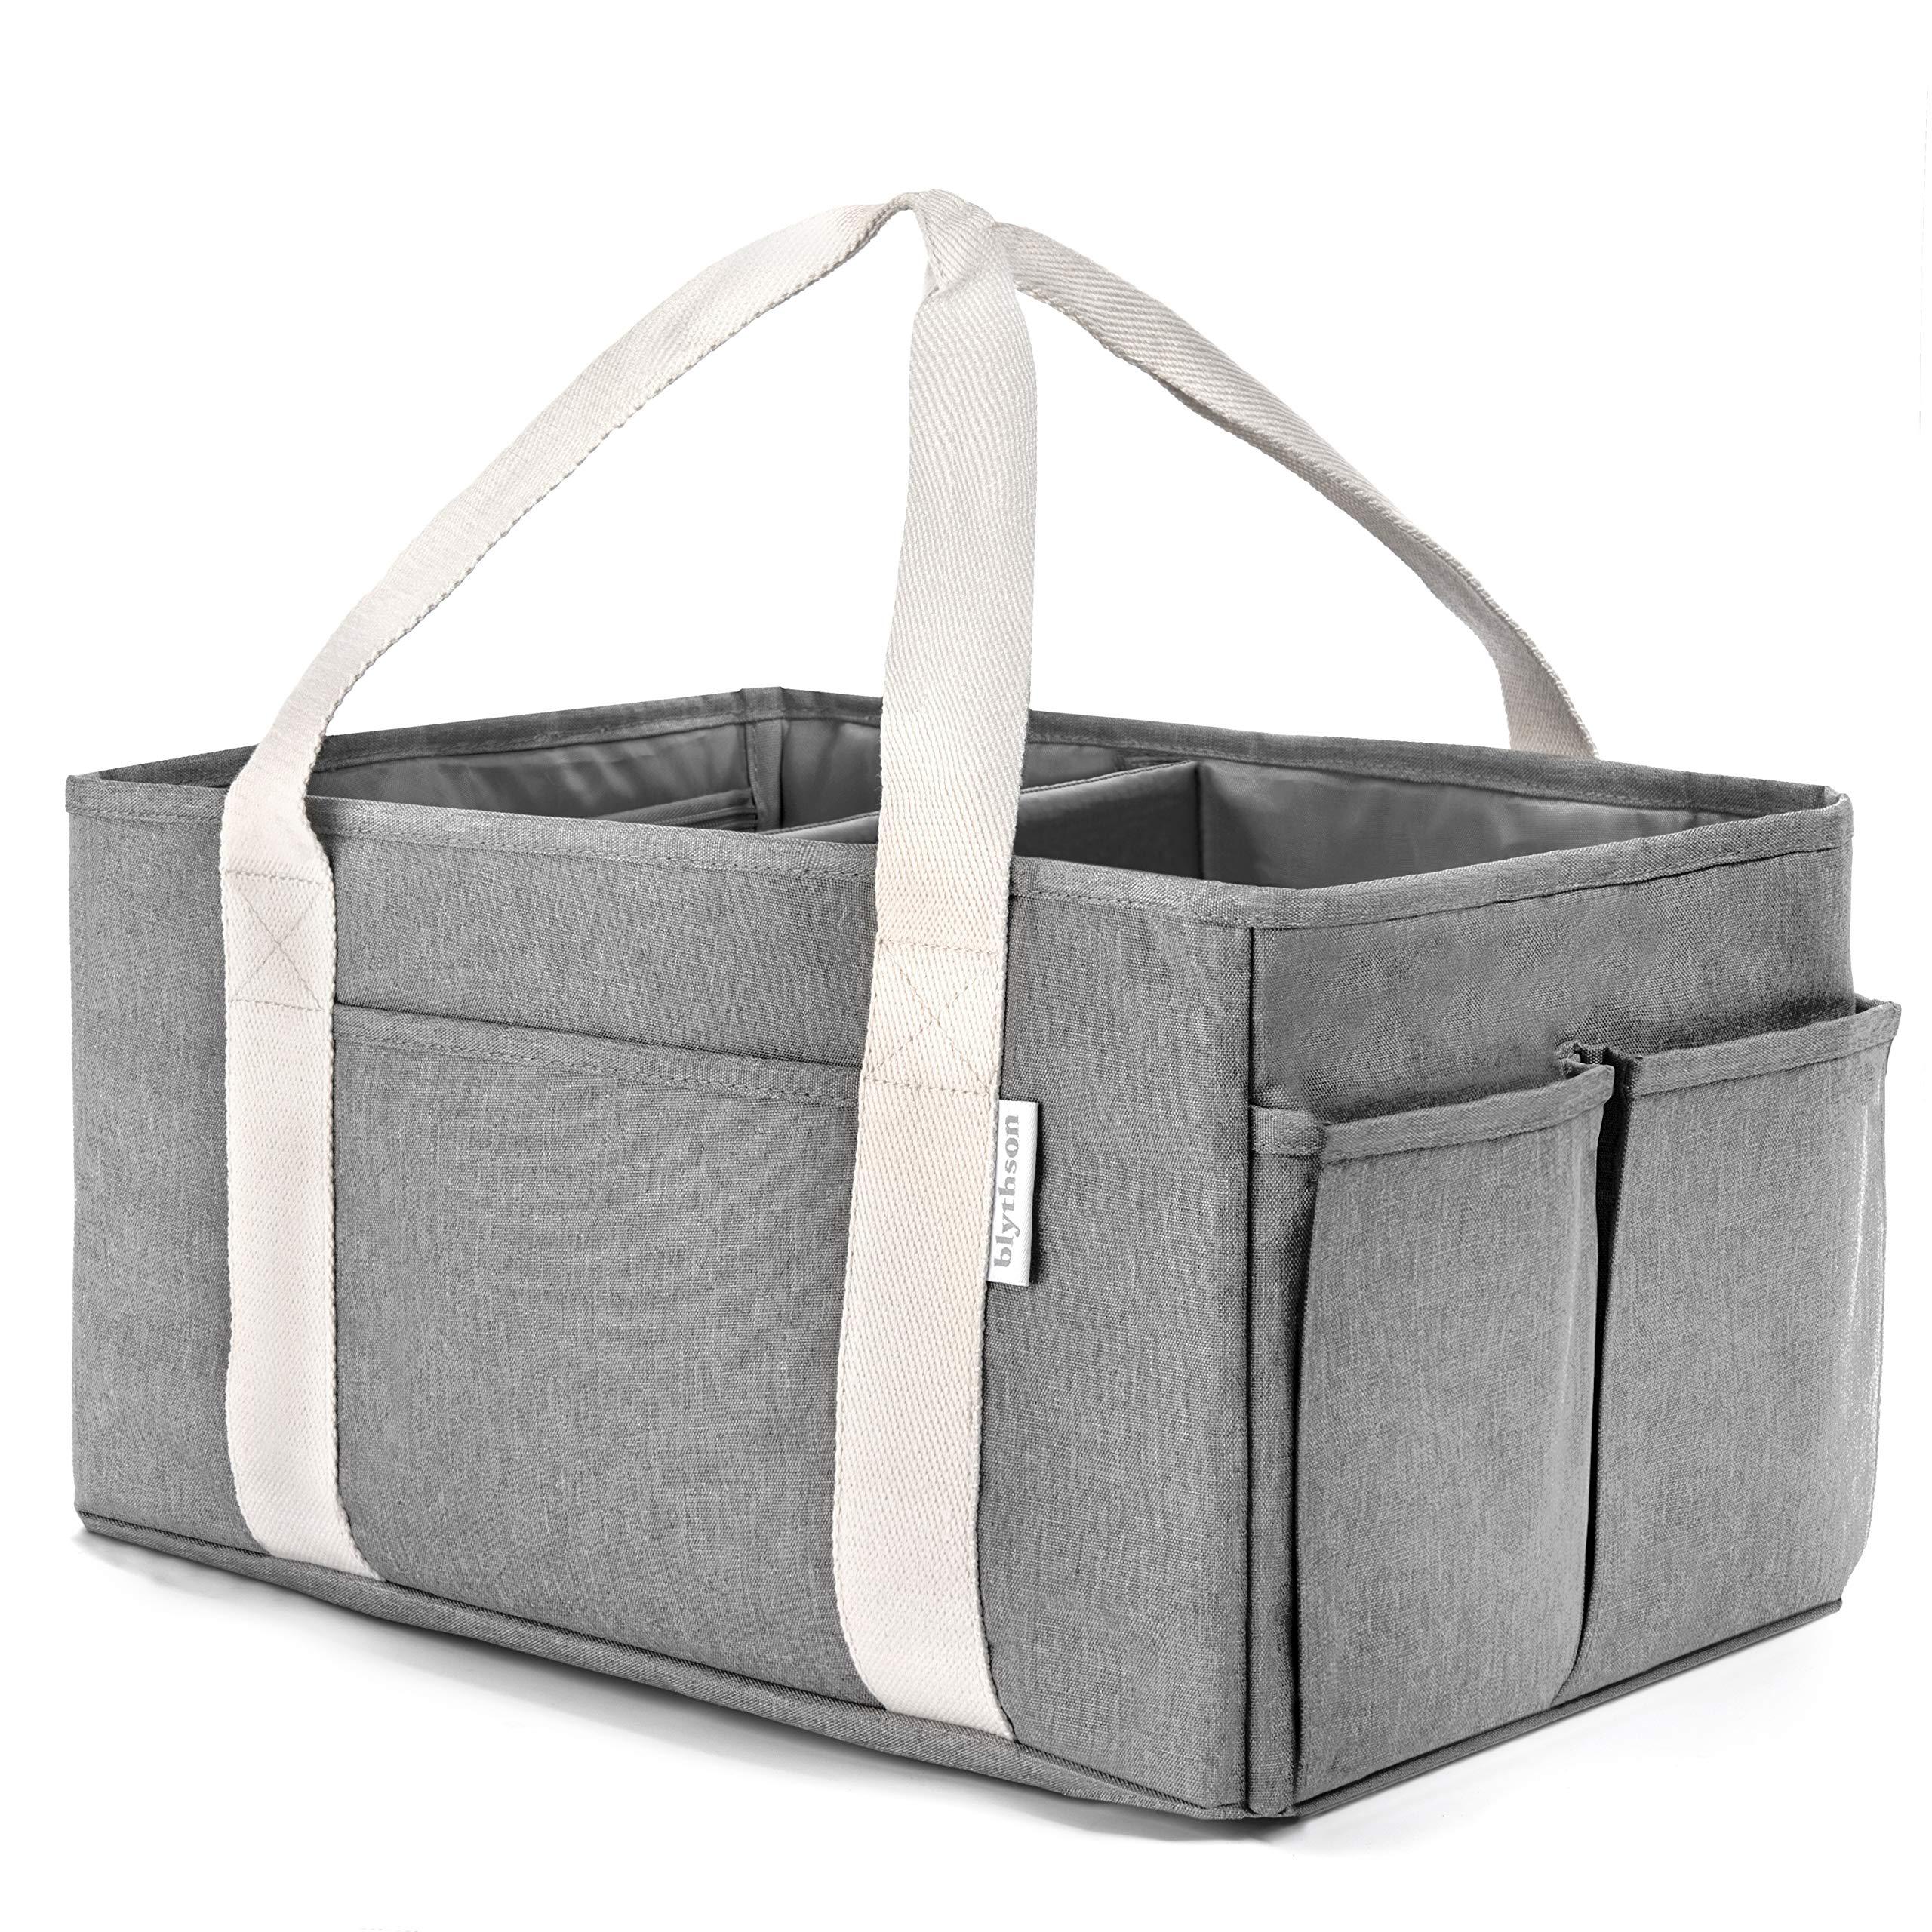 Blythson Baby Diaper Caddy Organizer, Portable Nursery Storage Bin, Gray by Blythson